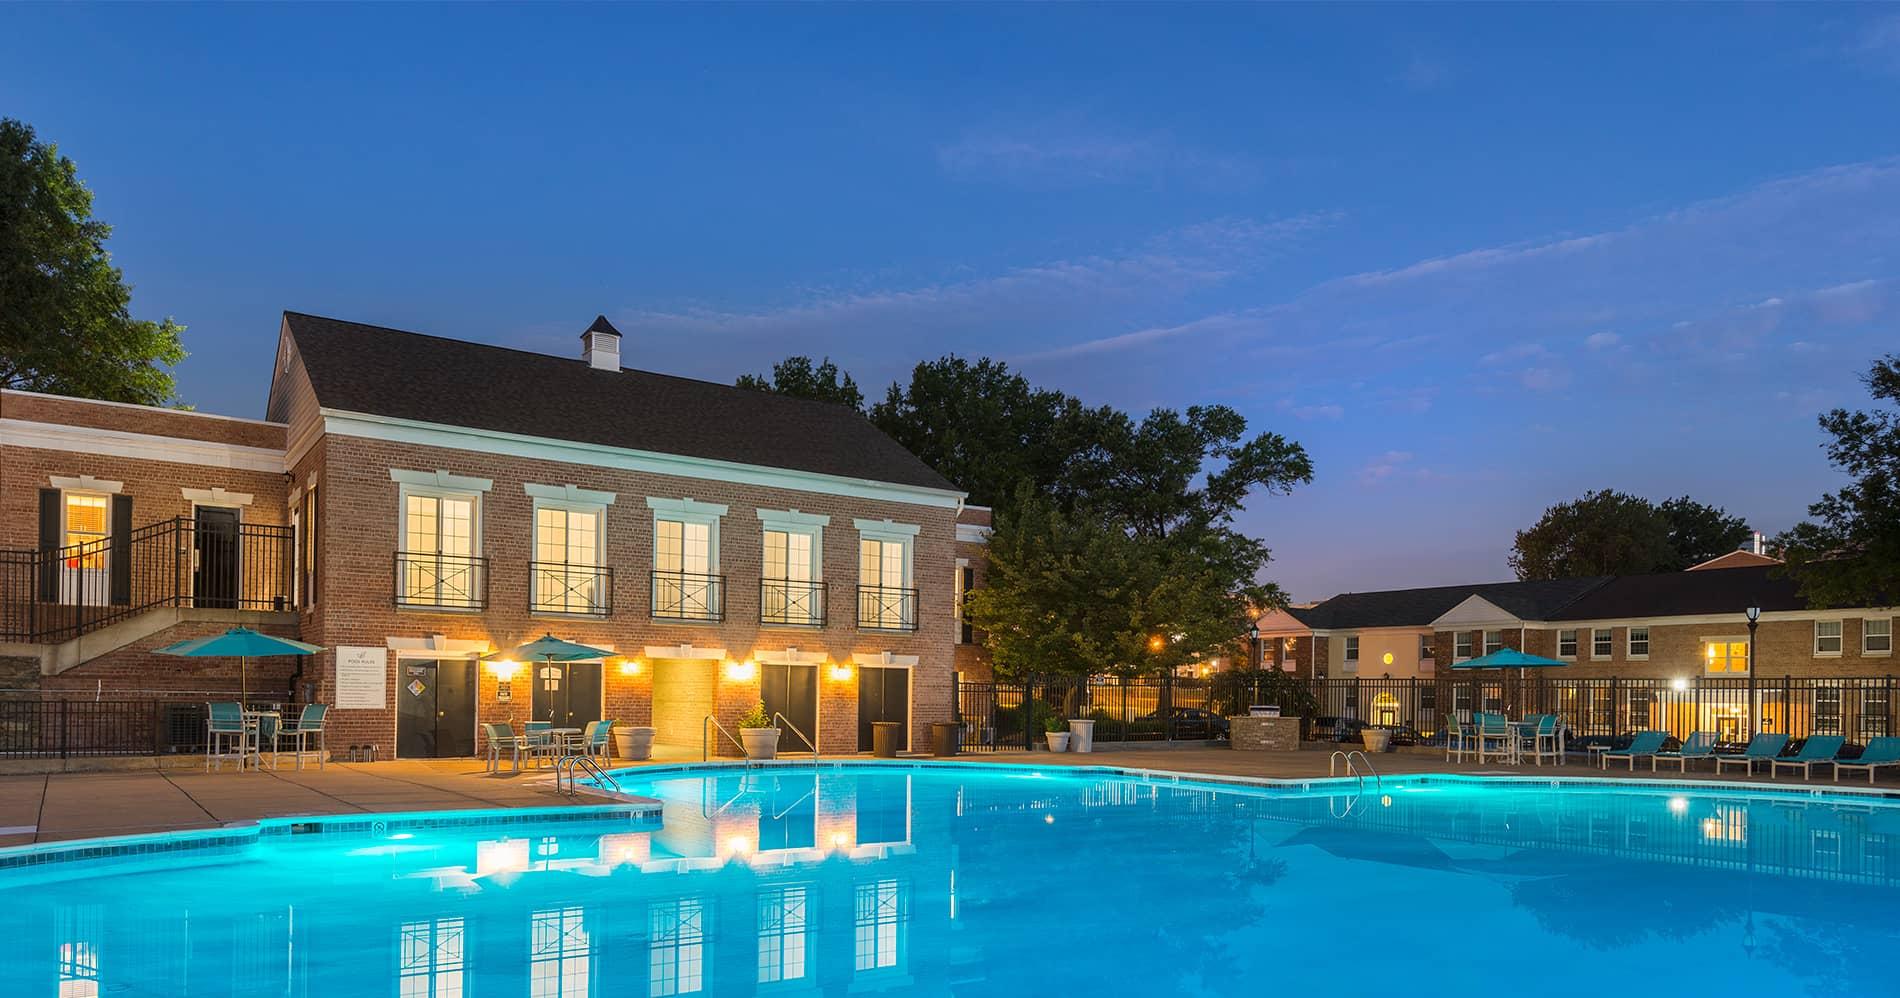 Newport village apartments in alexandria va for Newport swimming pool schedule